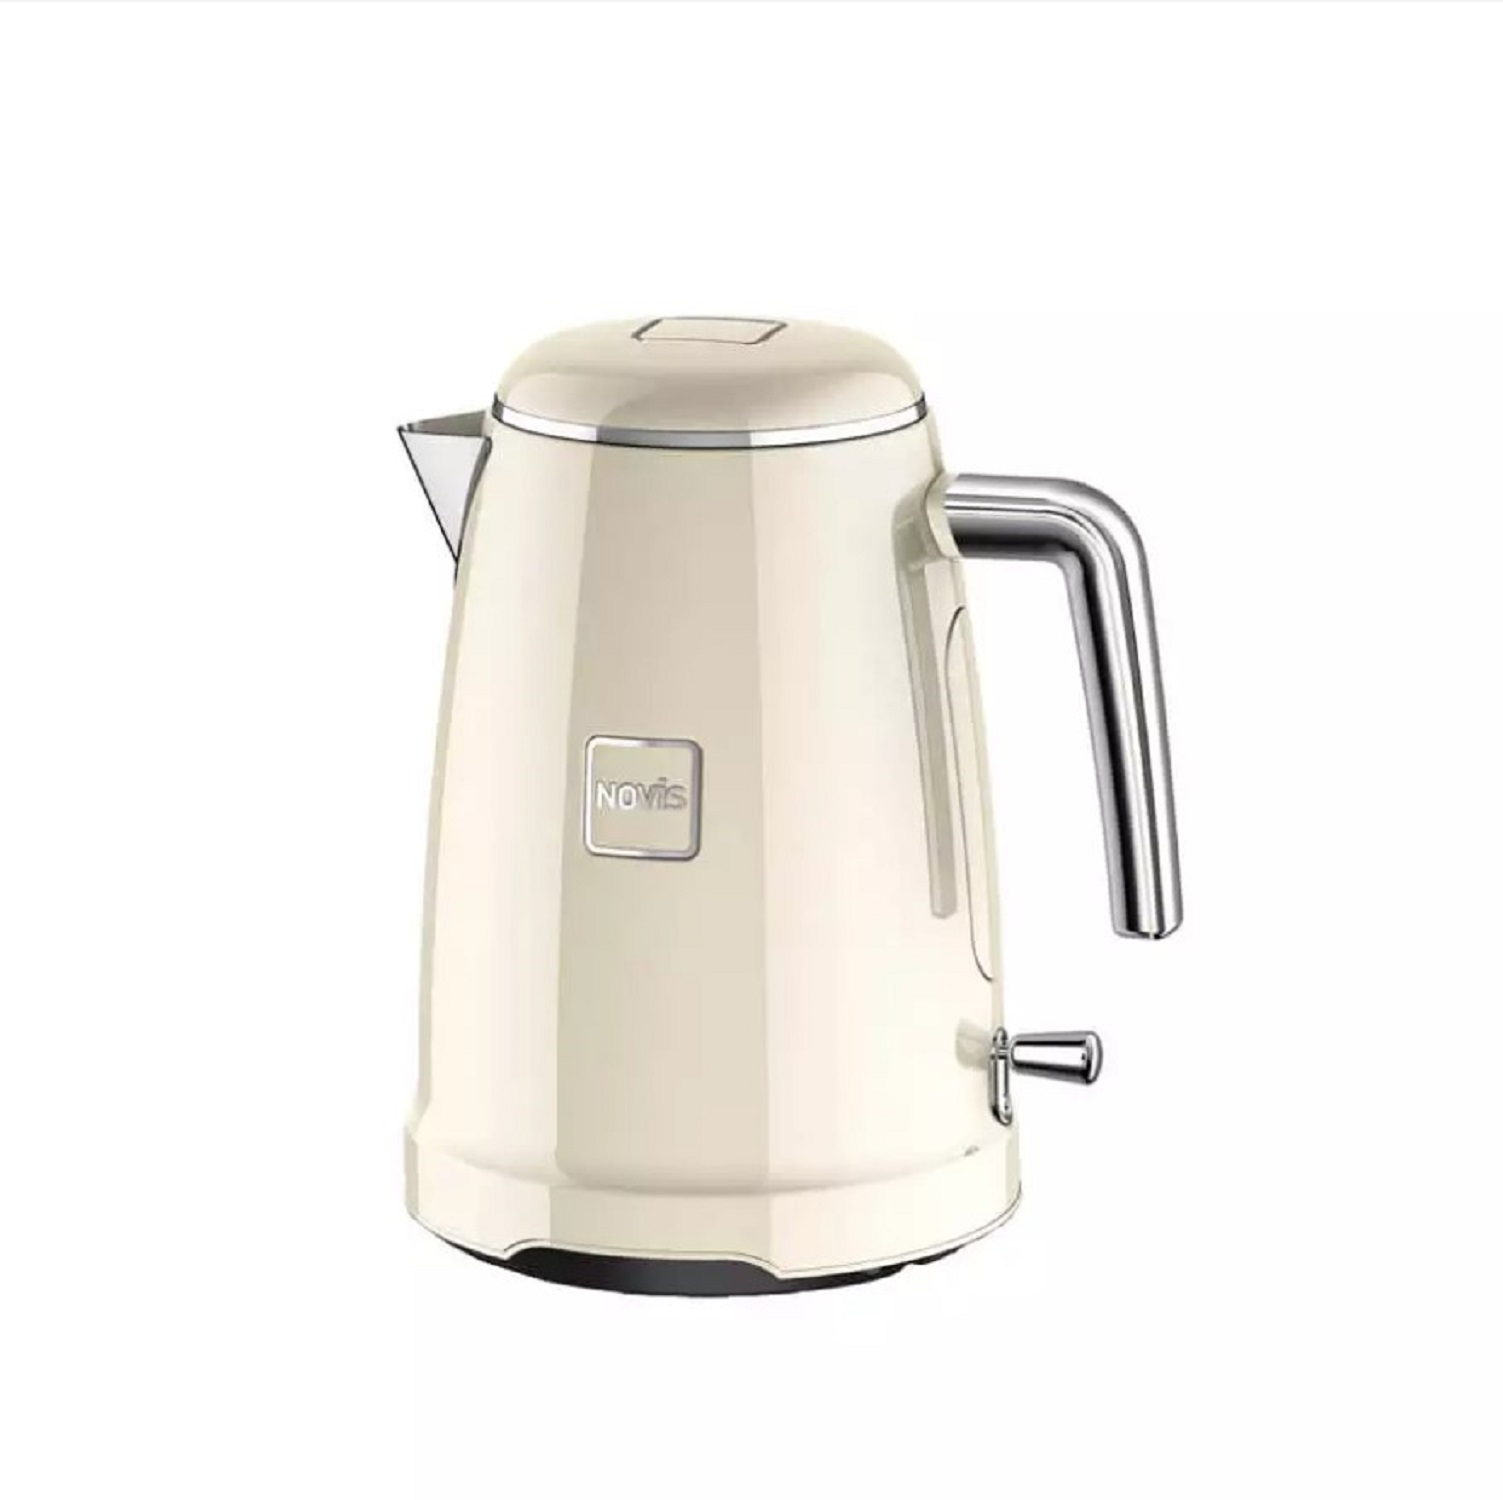 Онлайн каталог PROMENU: Чайник электрический Novis Kettle K1, объем 1,7 л, кремовый                               6113.09.20